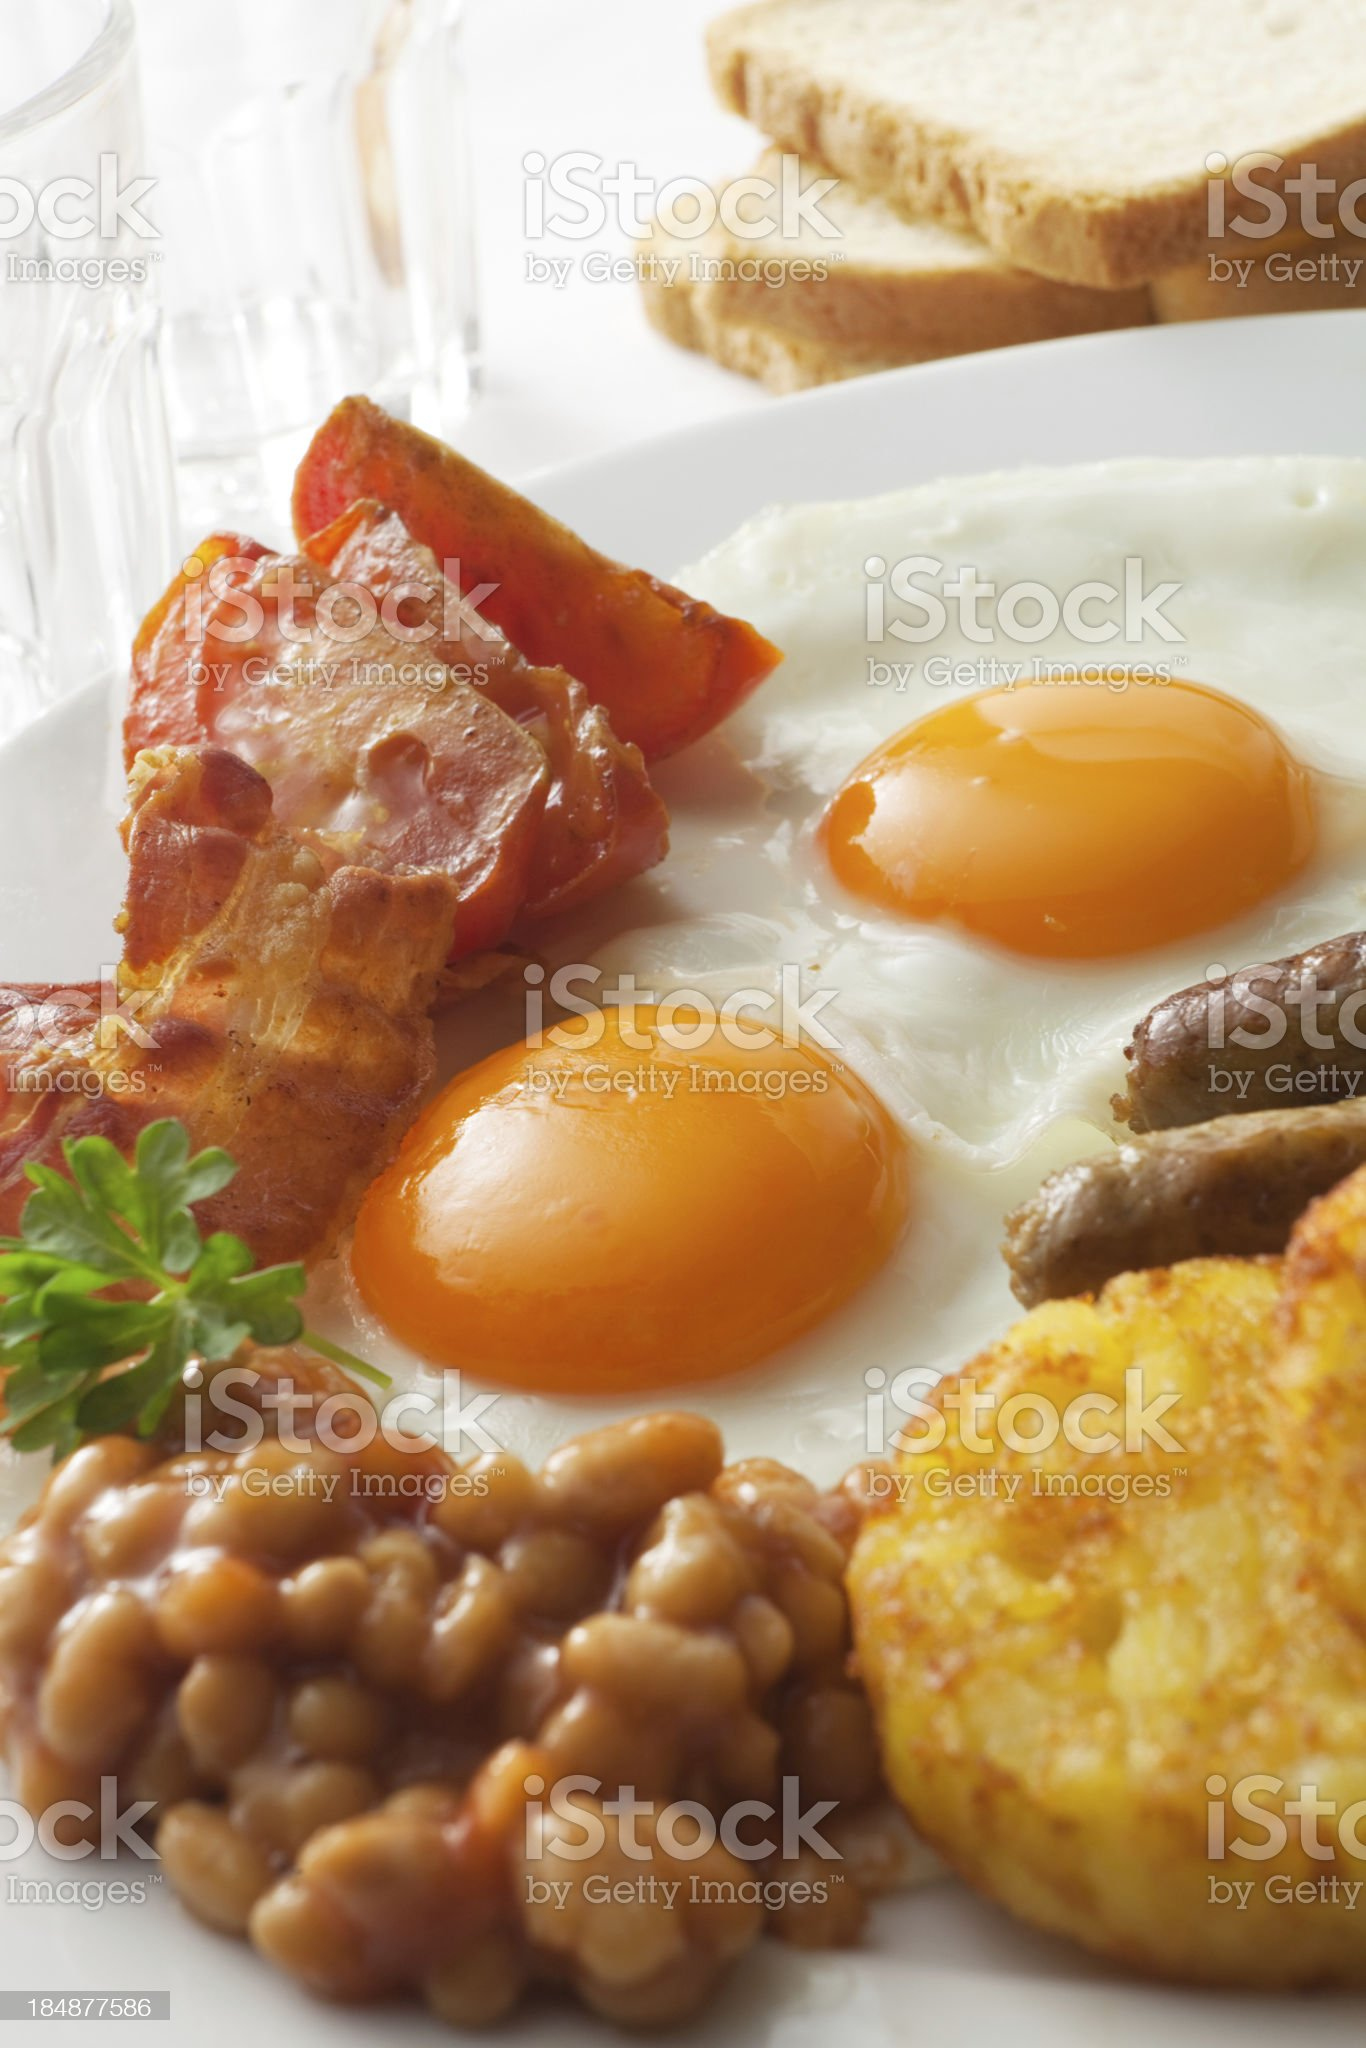 Breakfast Stills: English Fried Eggs royalty-free stock photo